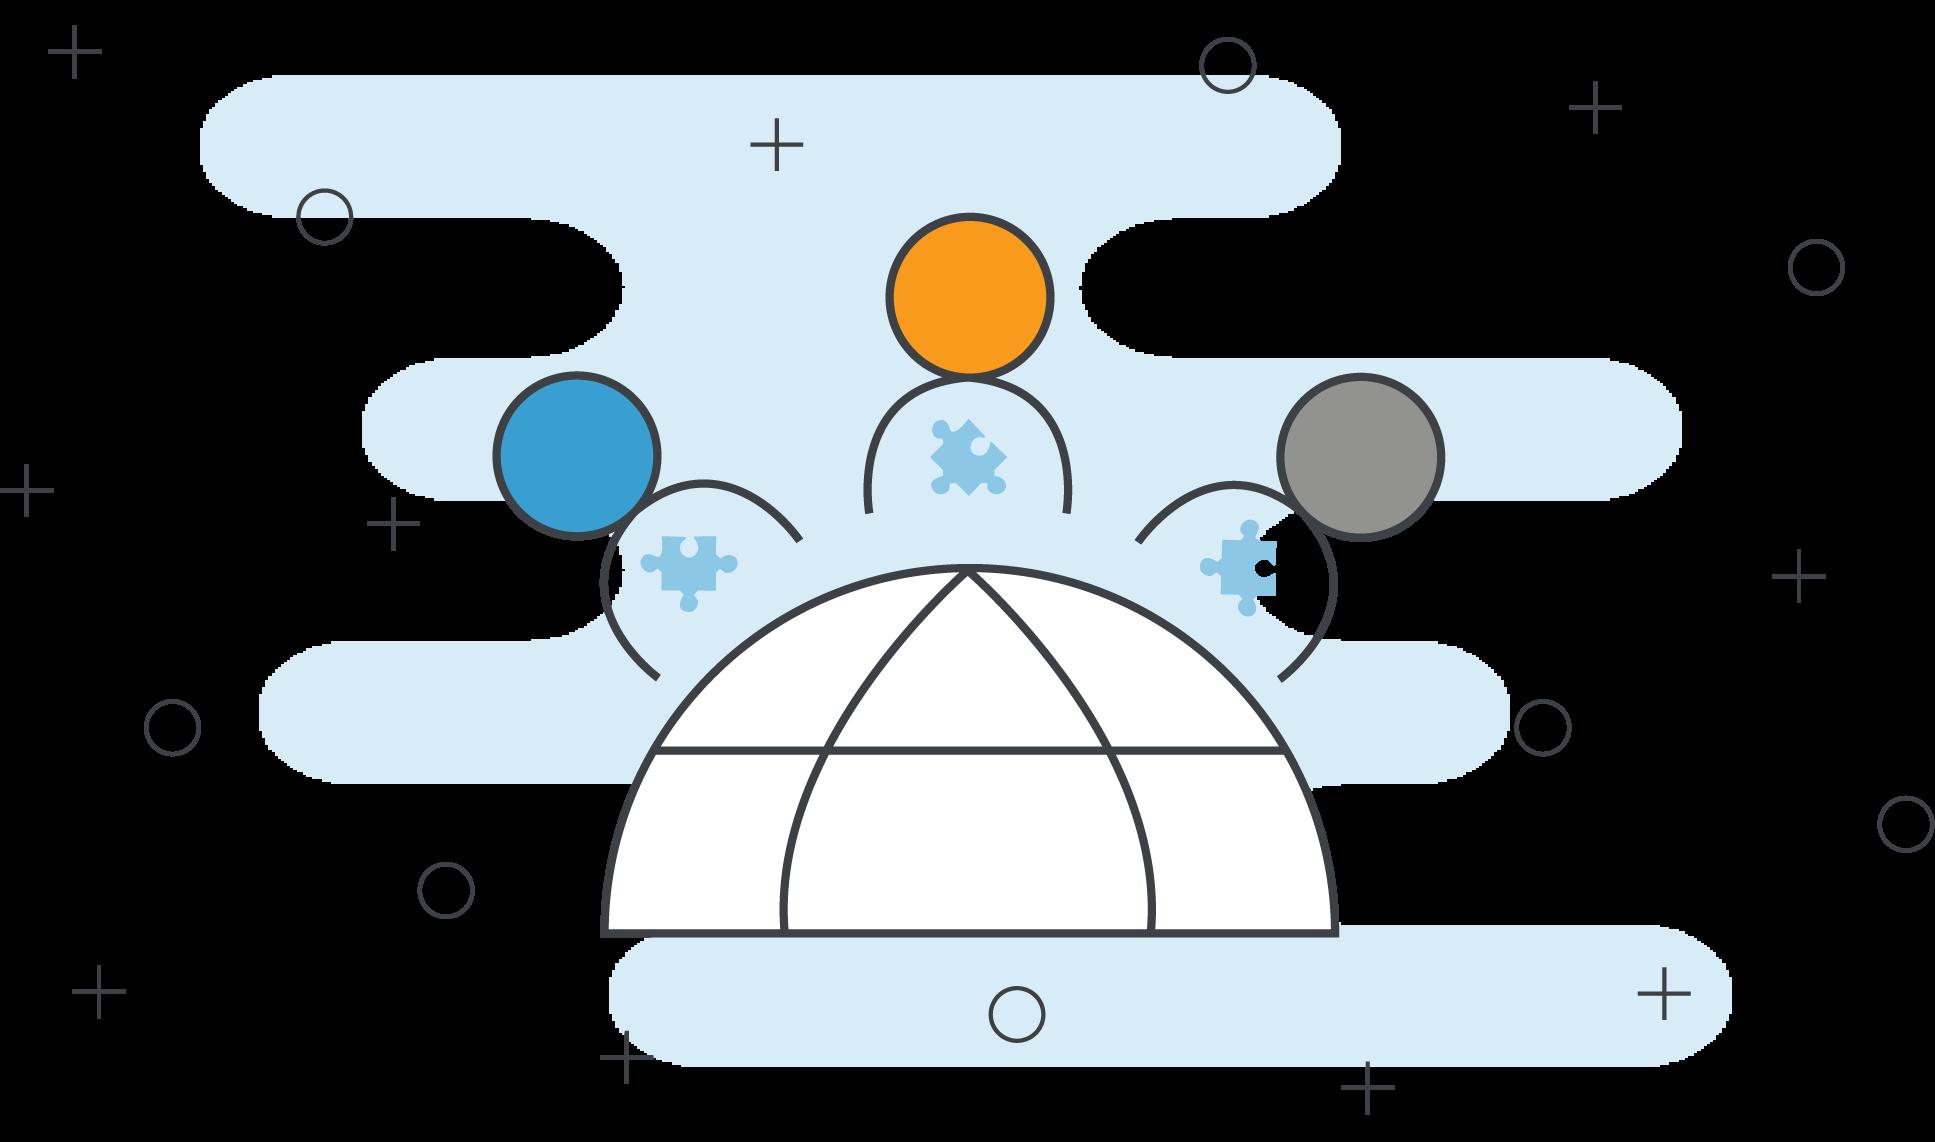 about-dynamix-company-values-teamwork